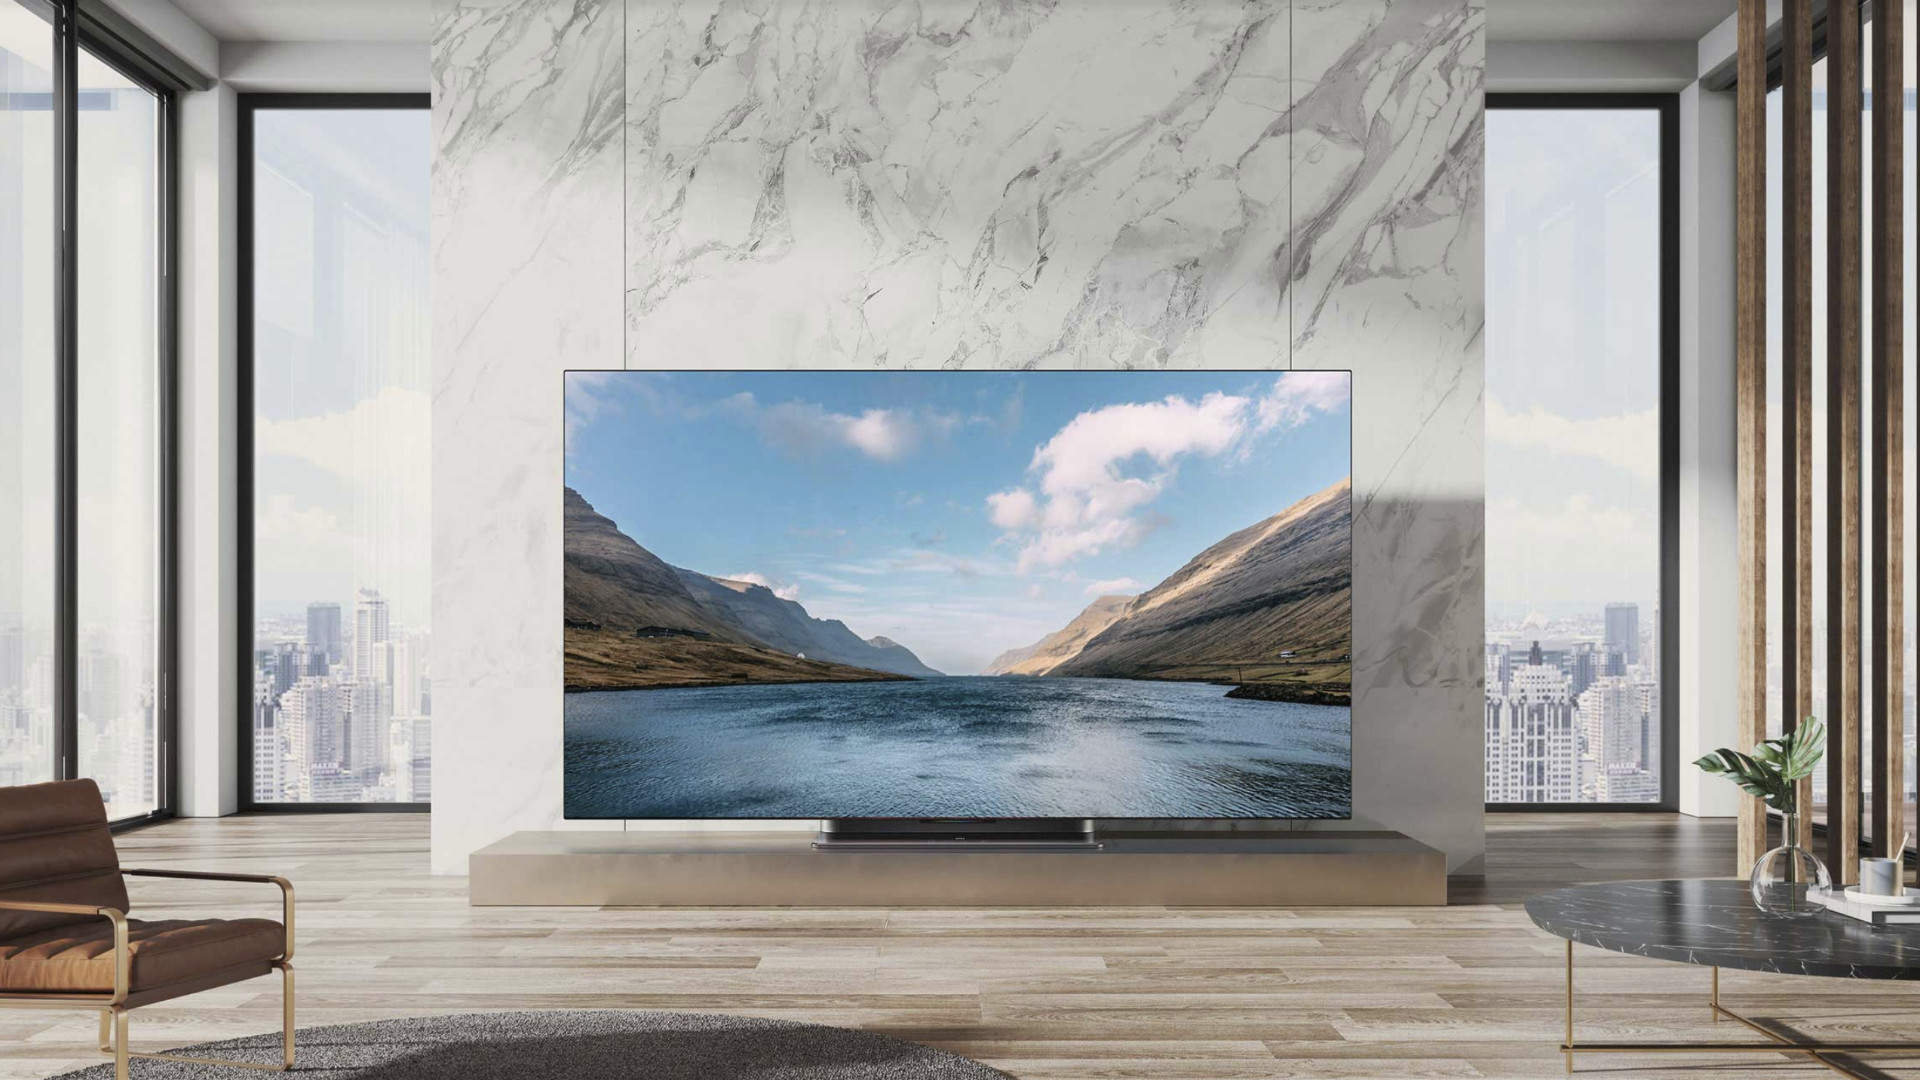 Xiaomi представила флагманский 65-дюймовый OLED-телевизор — Mi TV Master - Wylsa.com